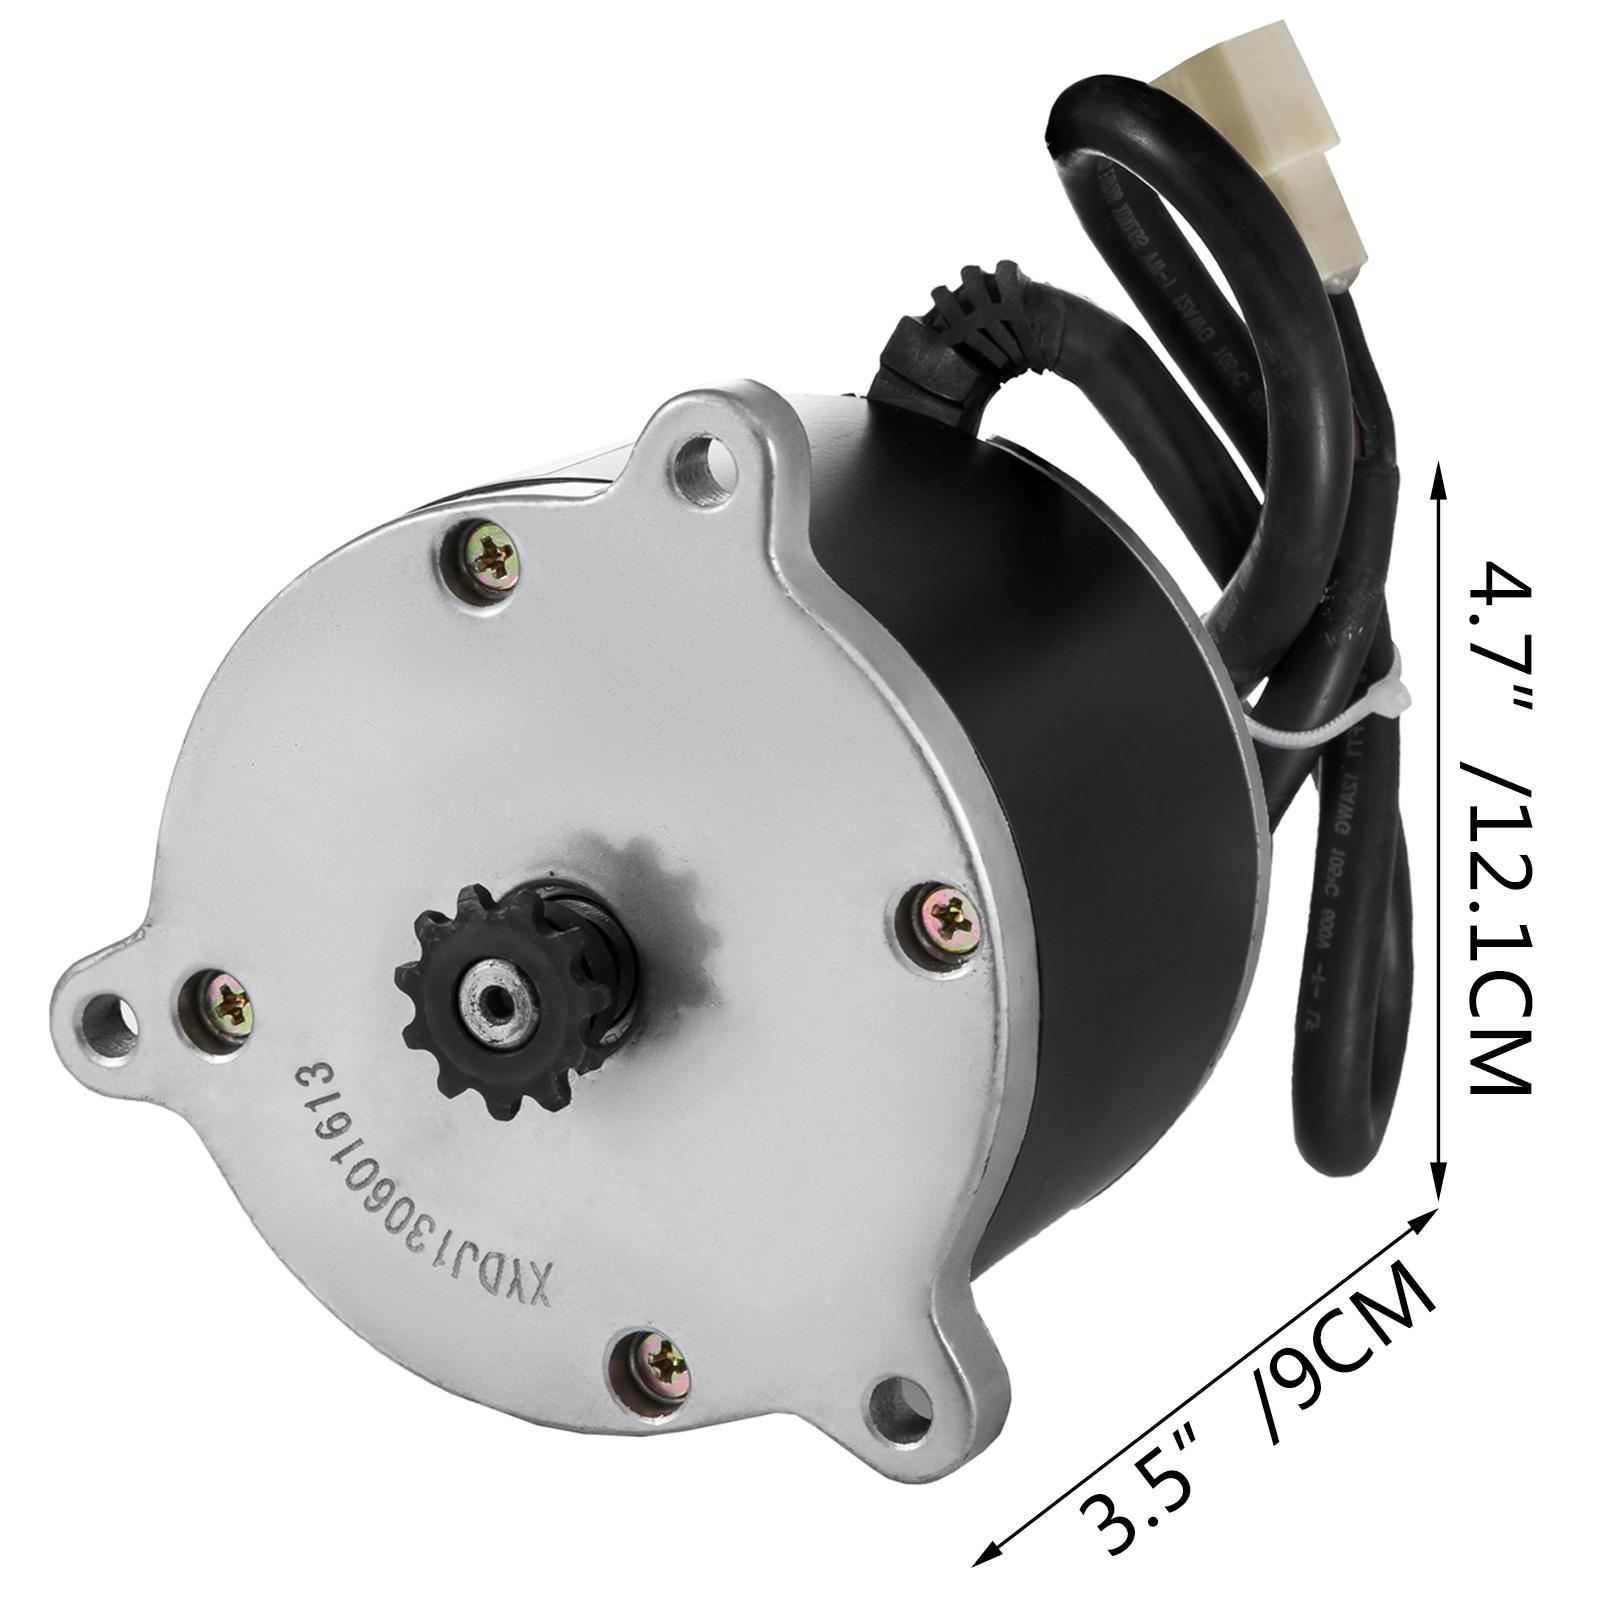 24V-500W-3500RPM-Electric-Motor-f-scooter-bike-go-kart-minibike-MY1016 thumbnail 44